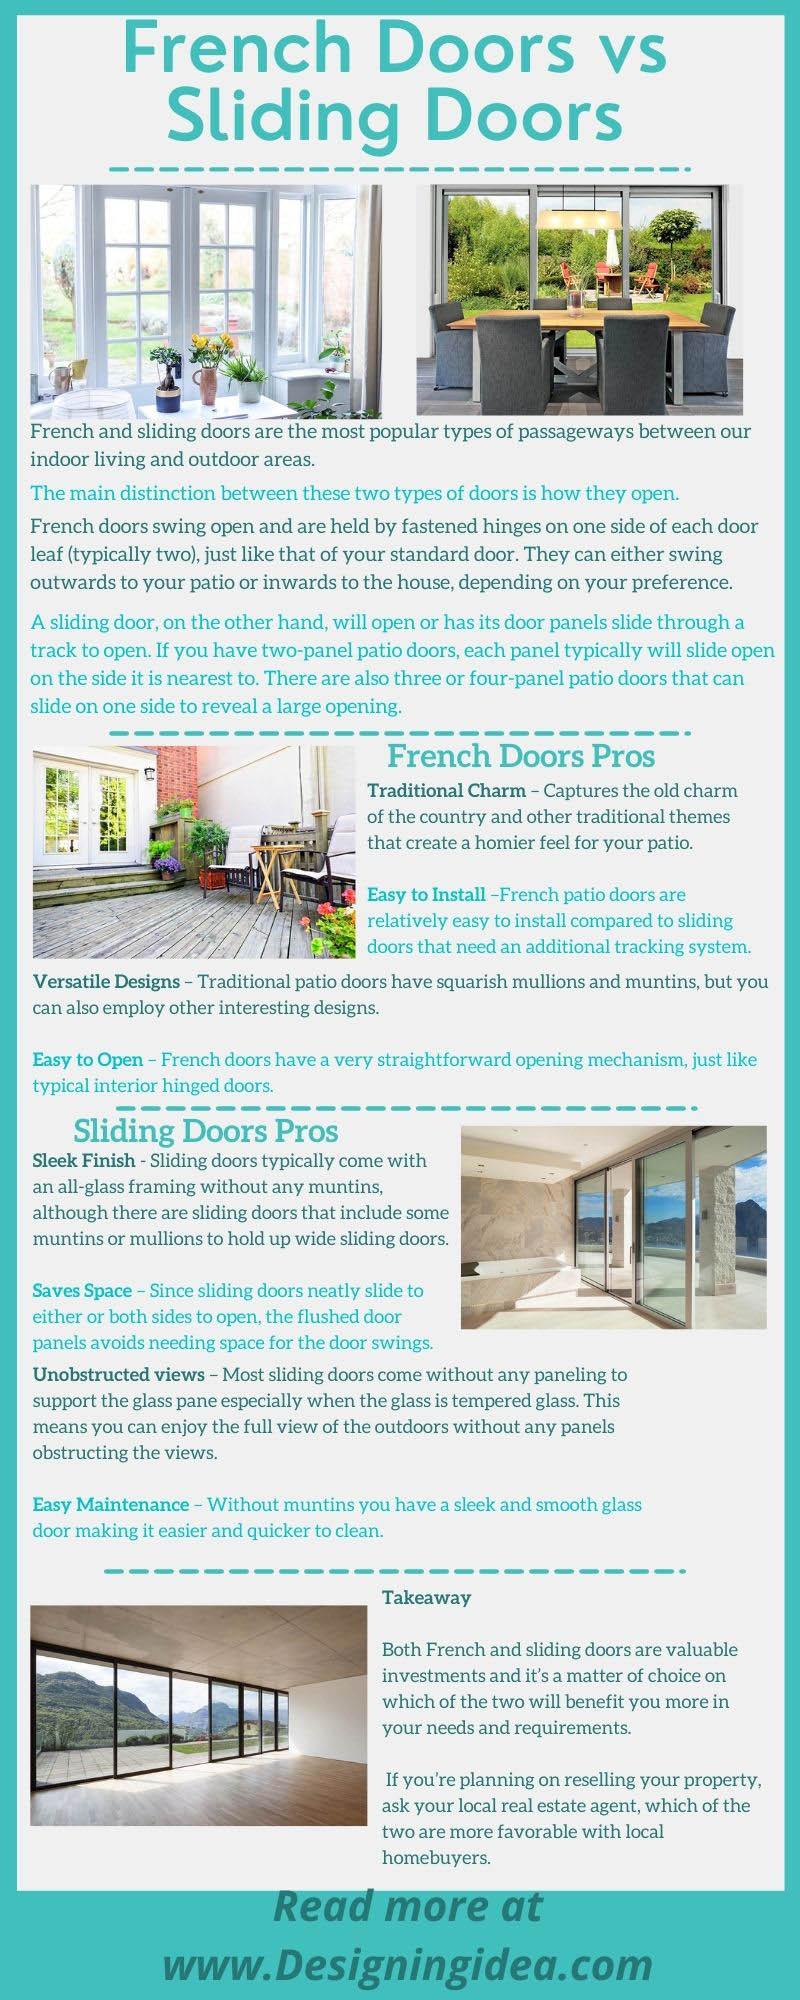 French doors vs sliding doors infographic